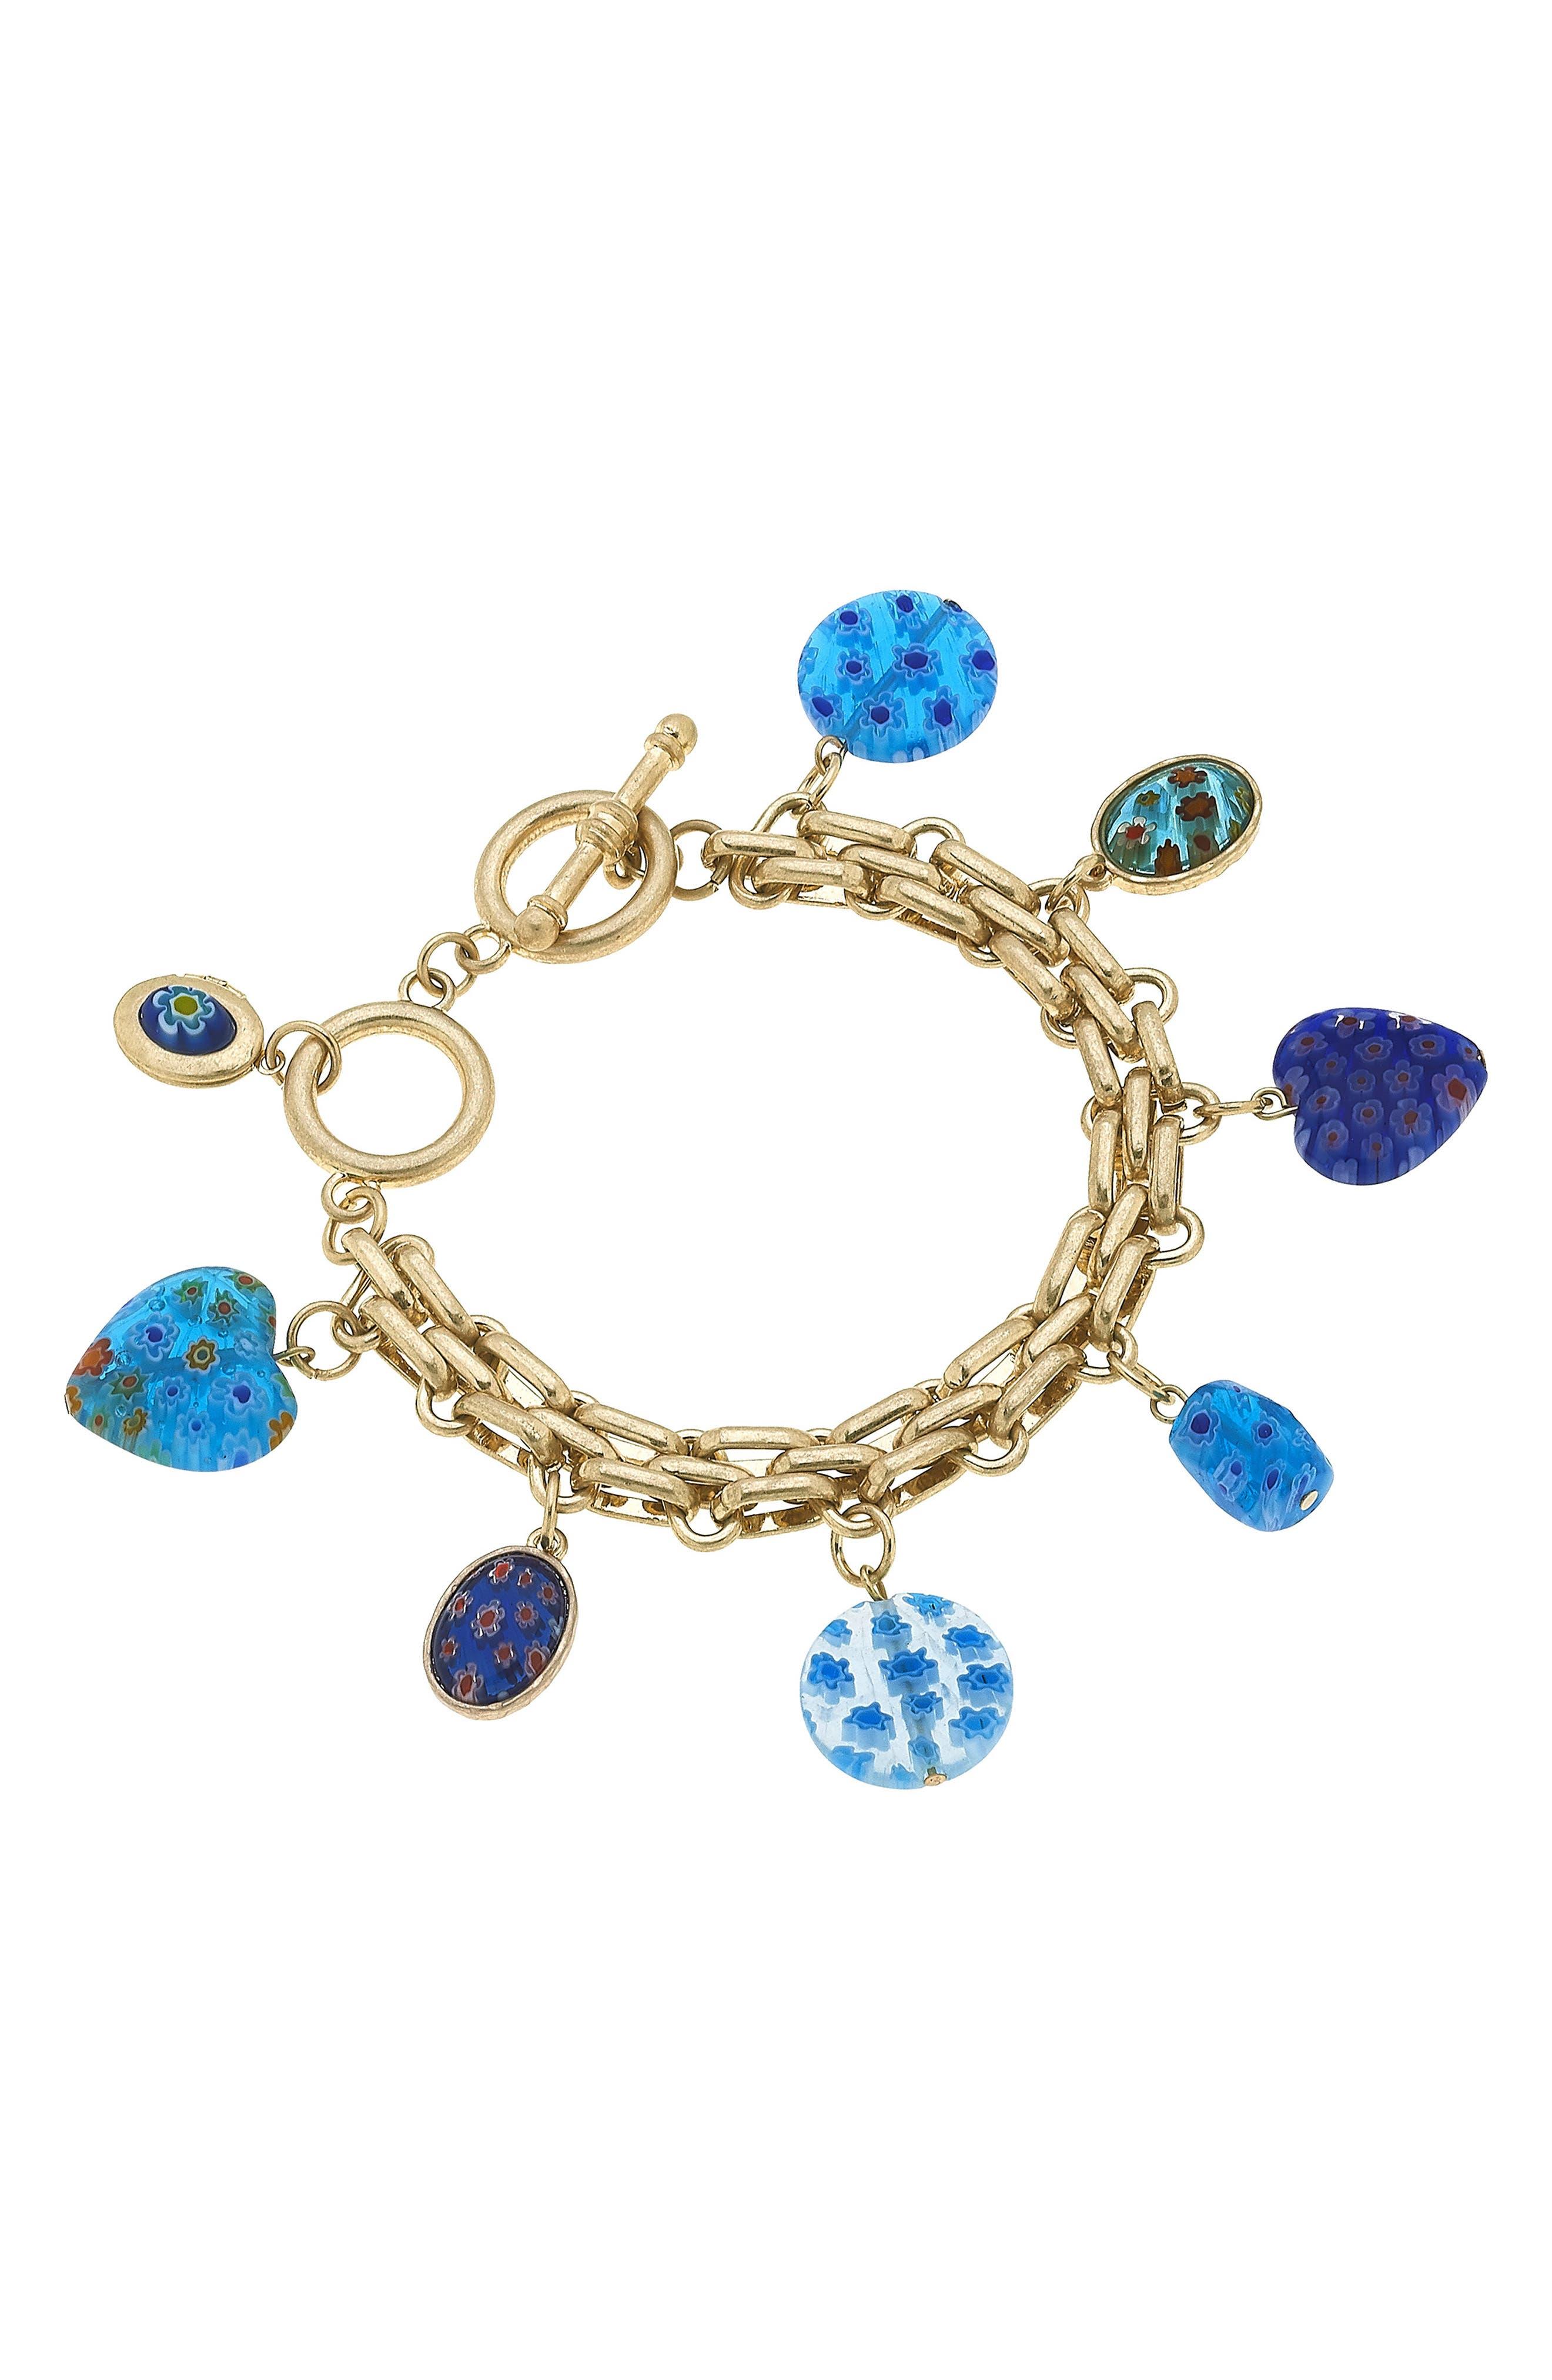 Millefiori Charm Bracelet